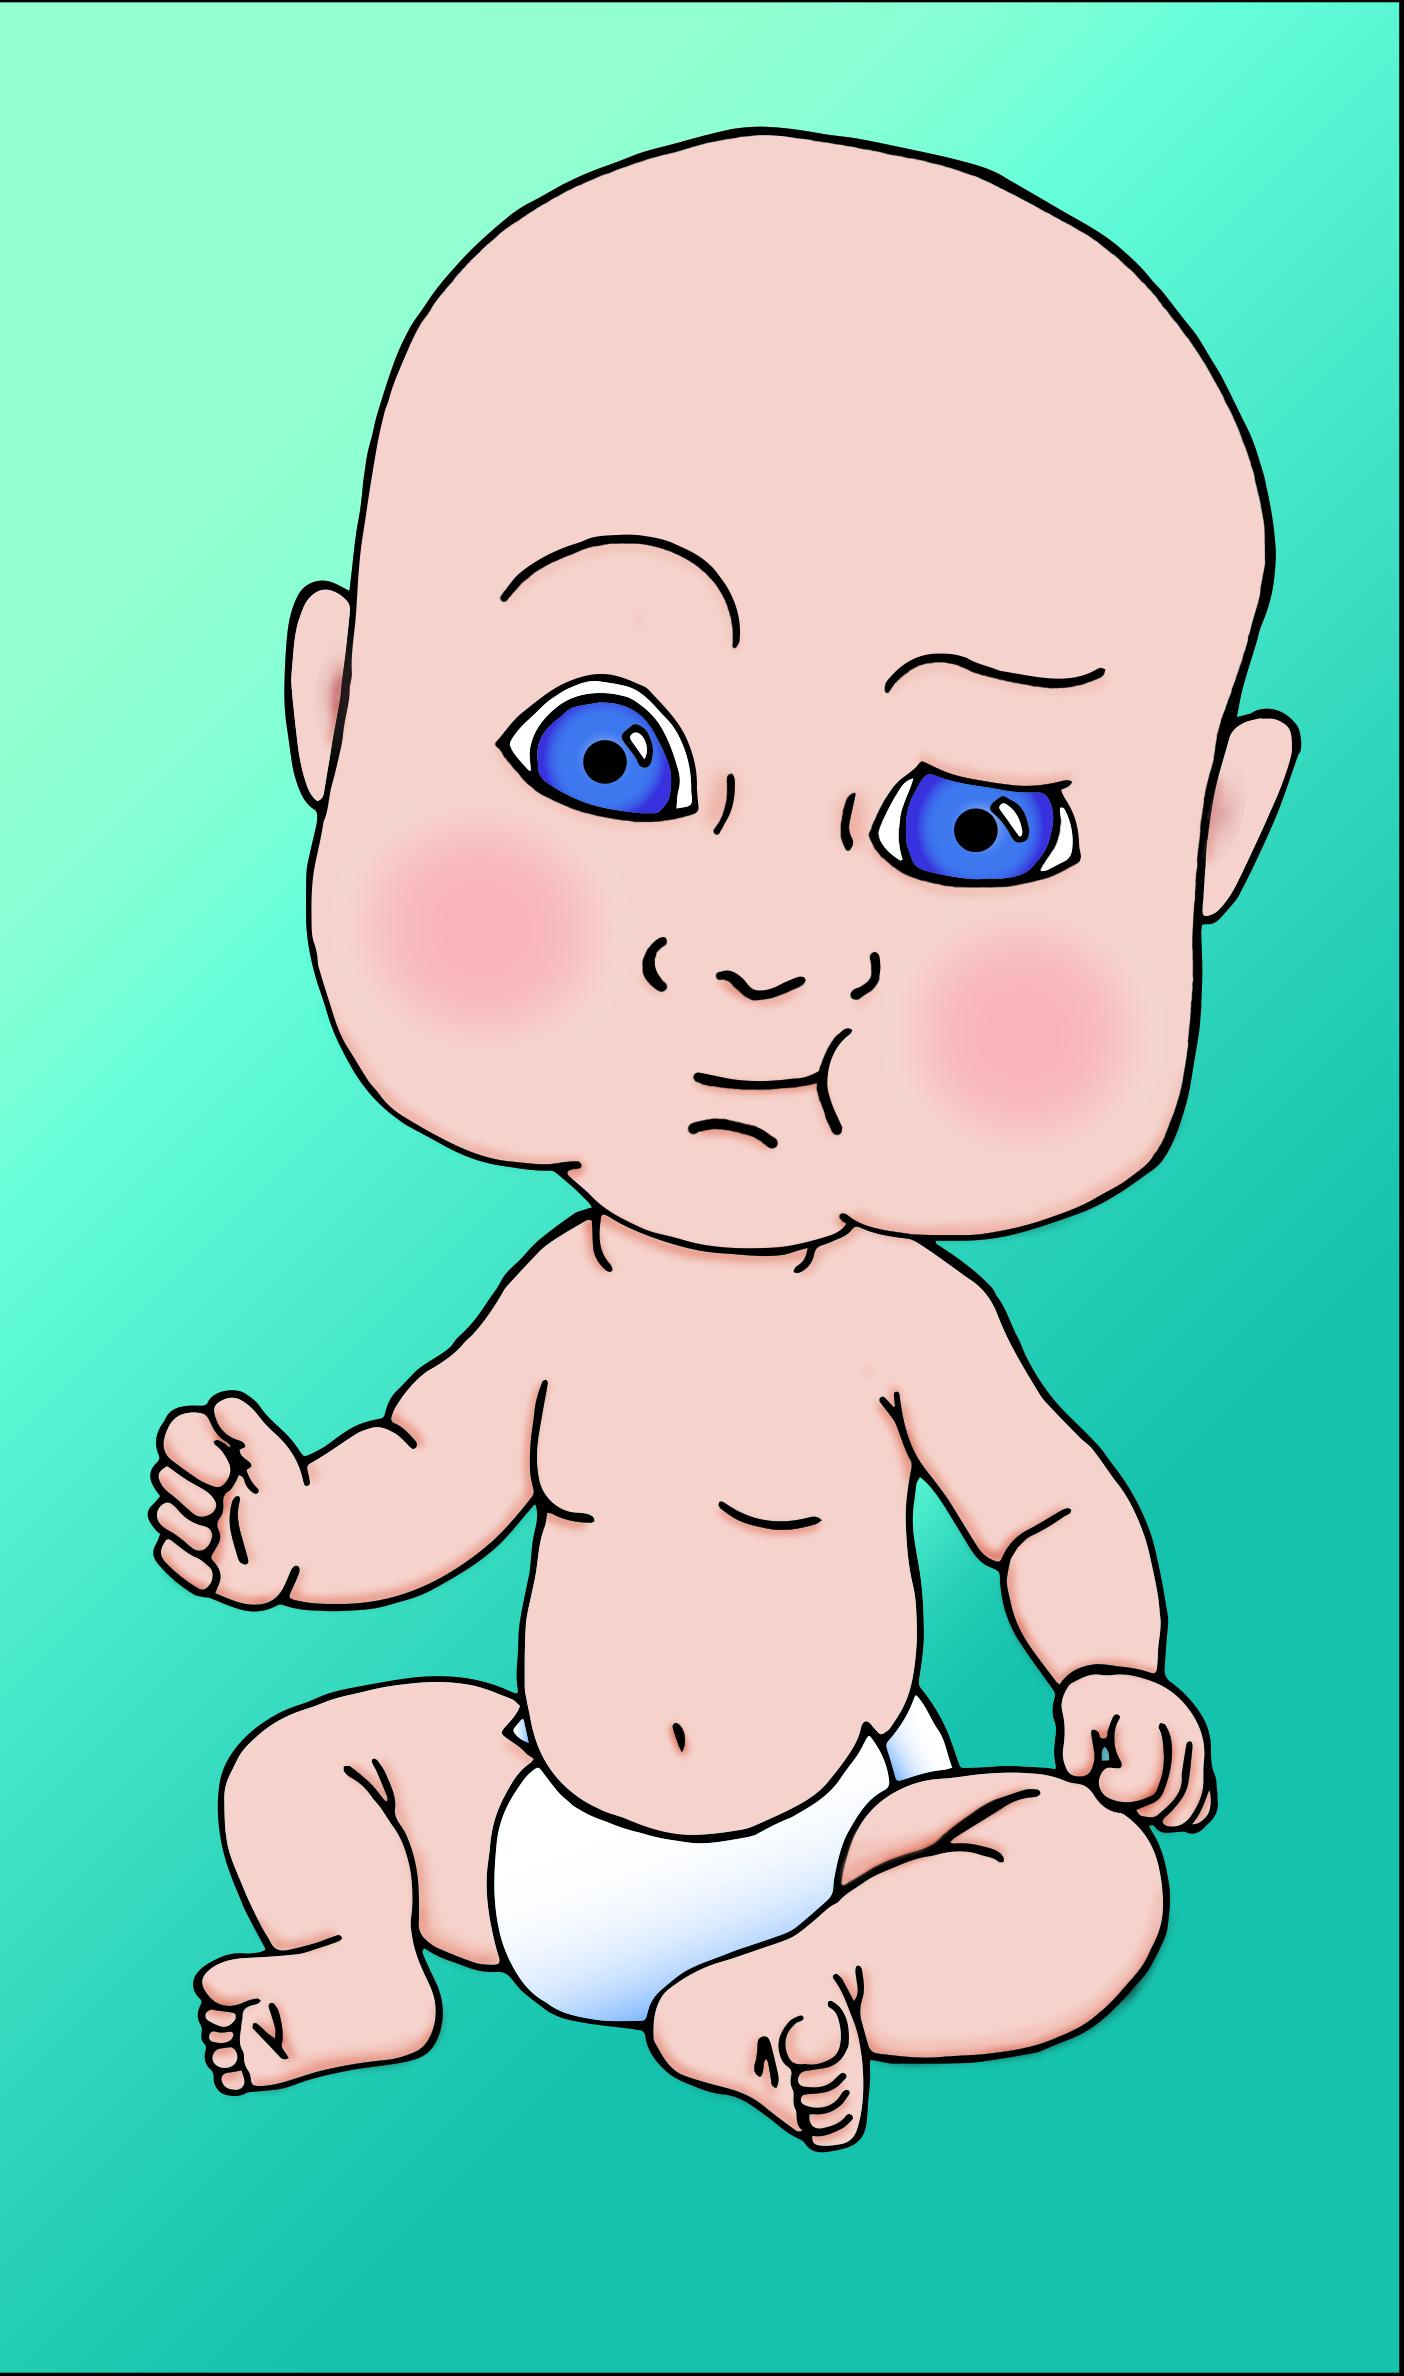 Transparent baby moana clipart - Baby Head Png - Big Head Baby Cartoon